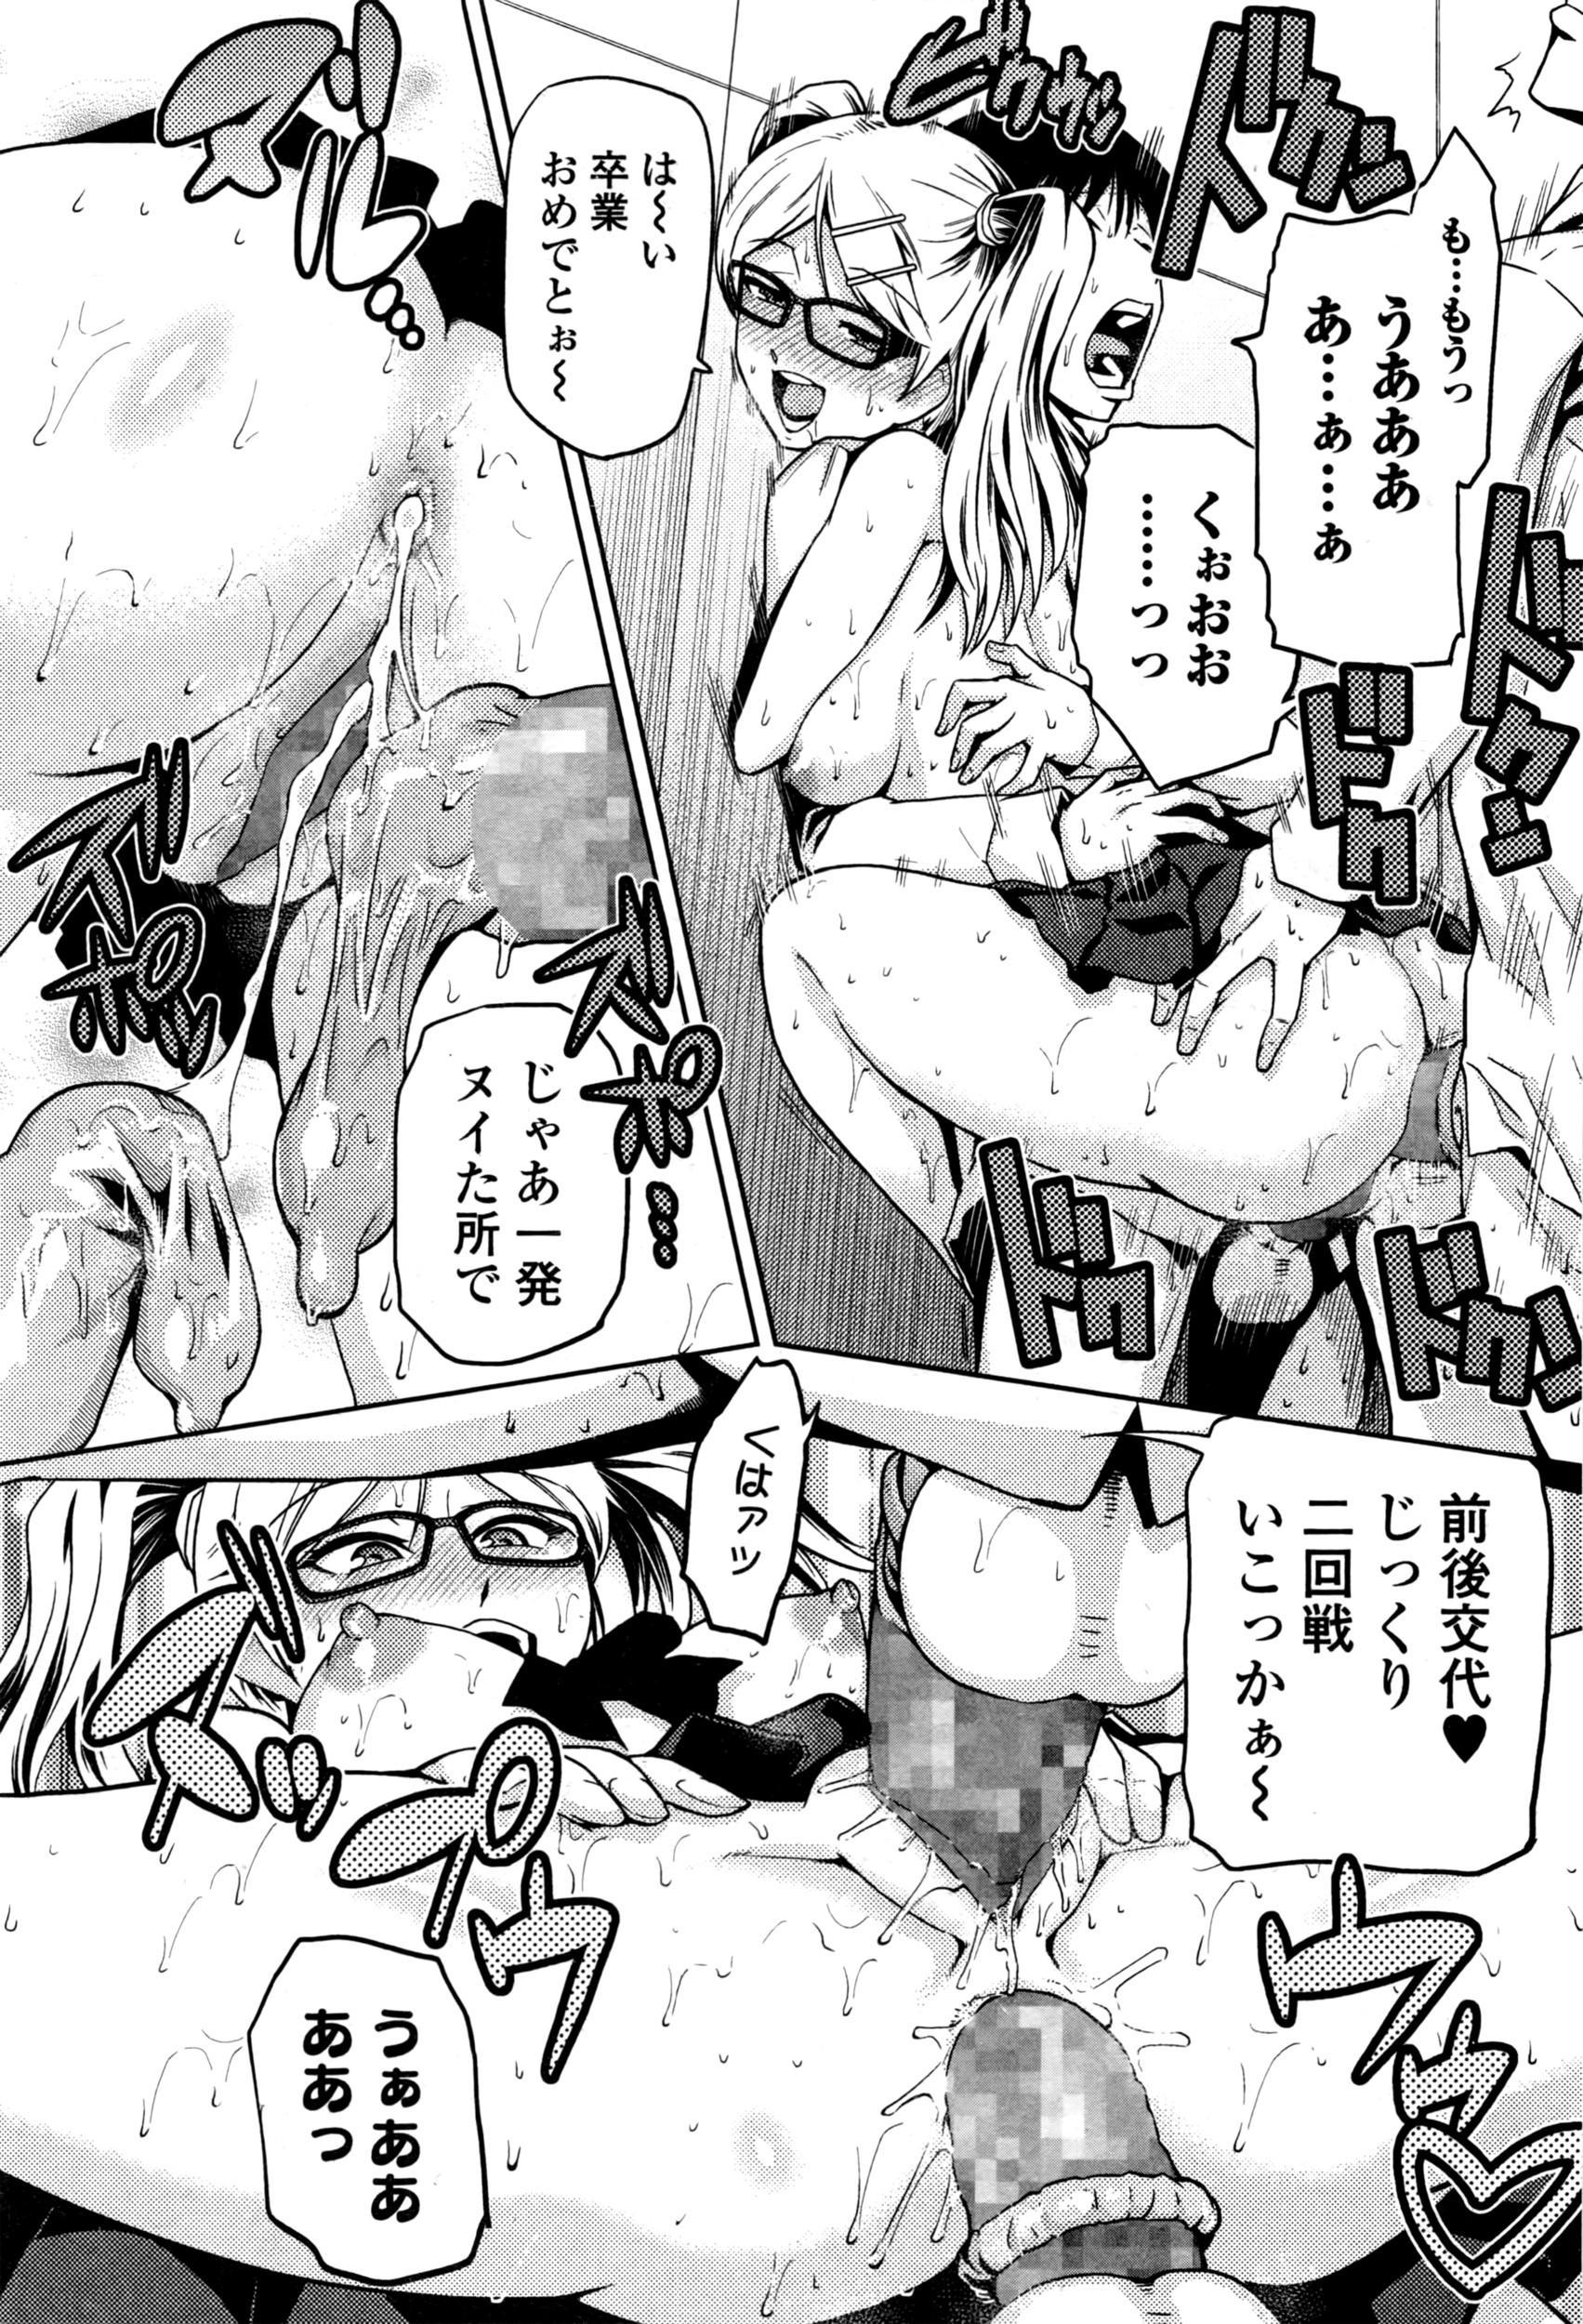 Comic JSCK Vol.3 2016-03 148